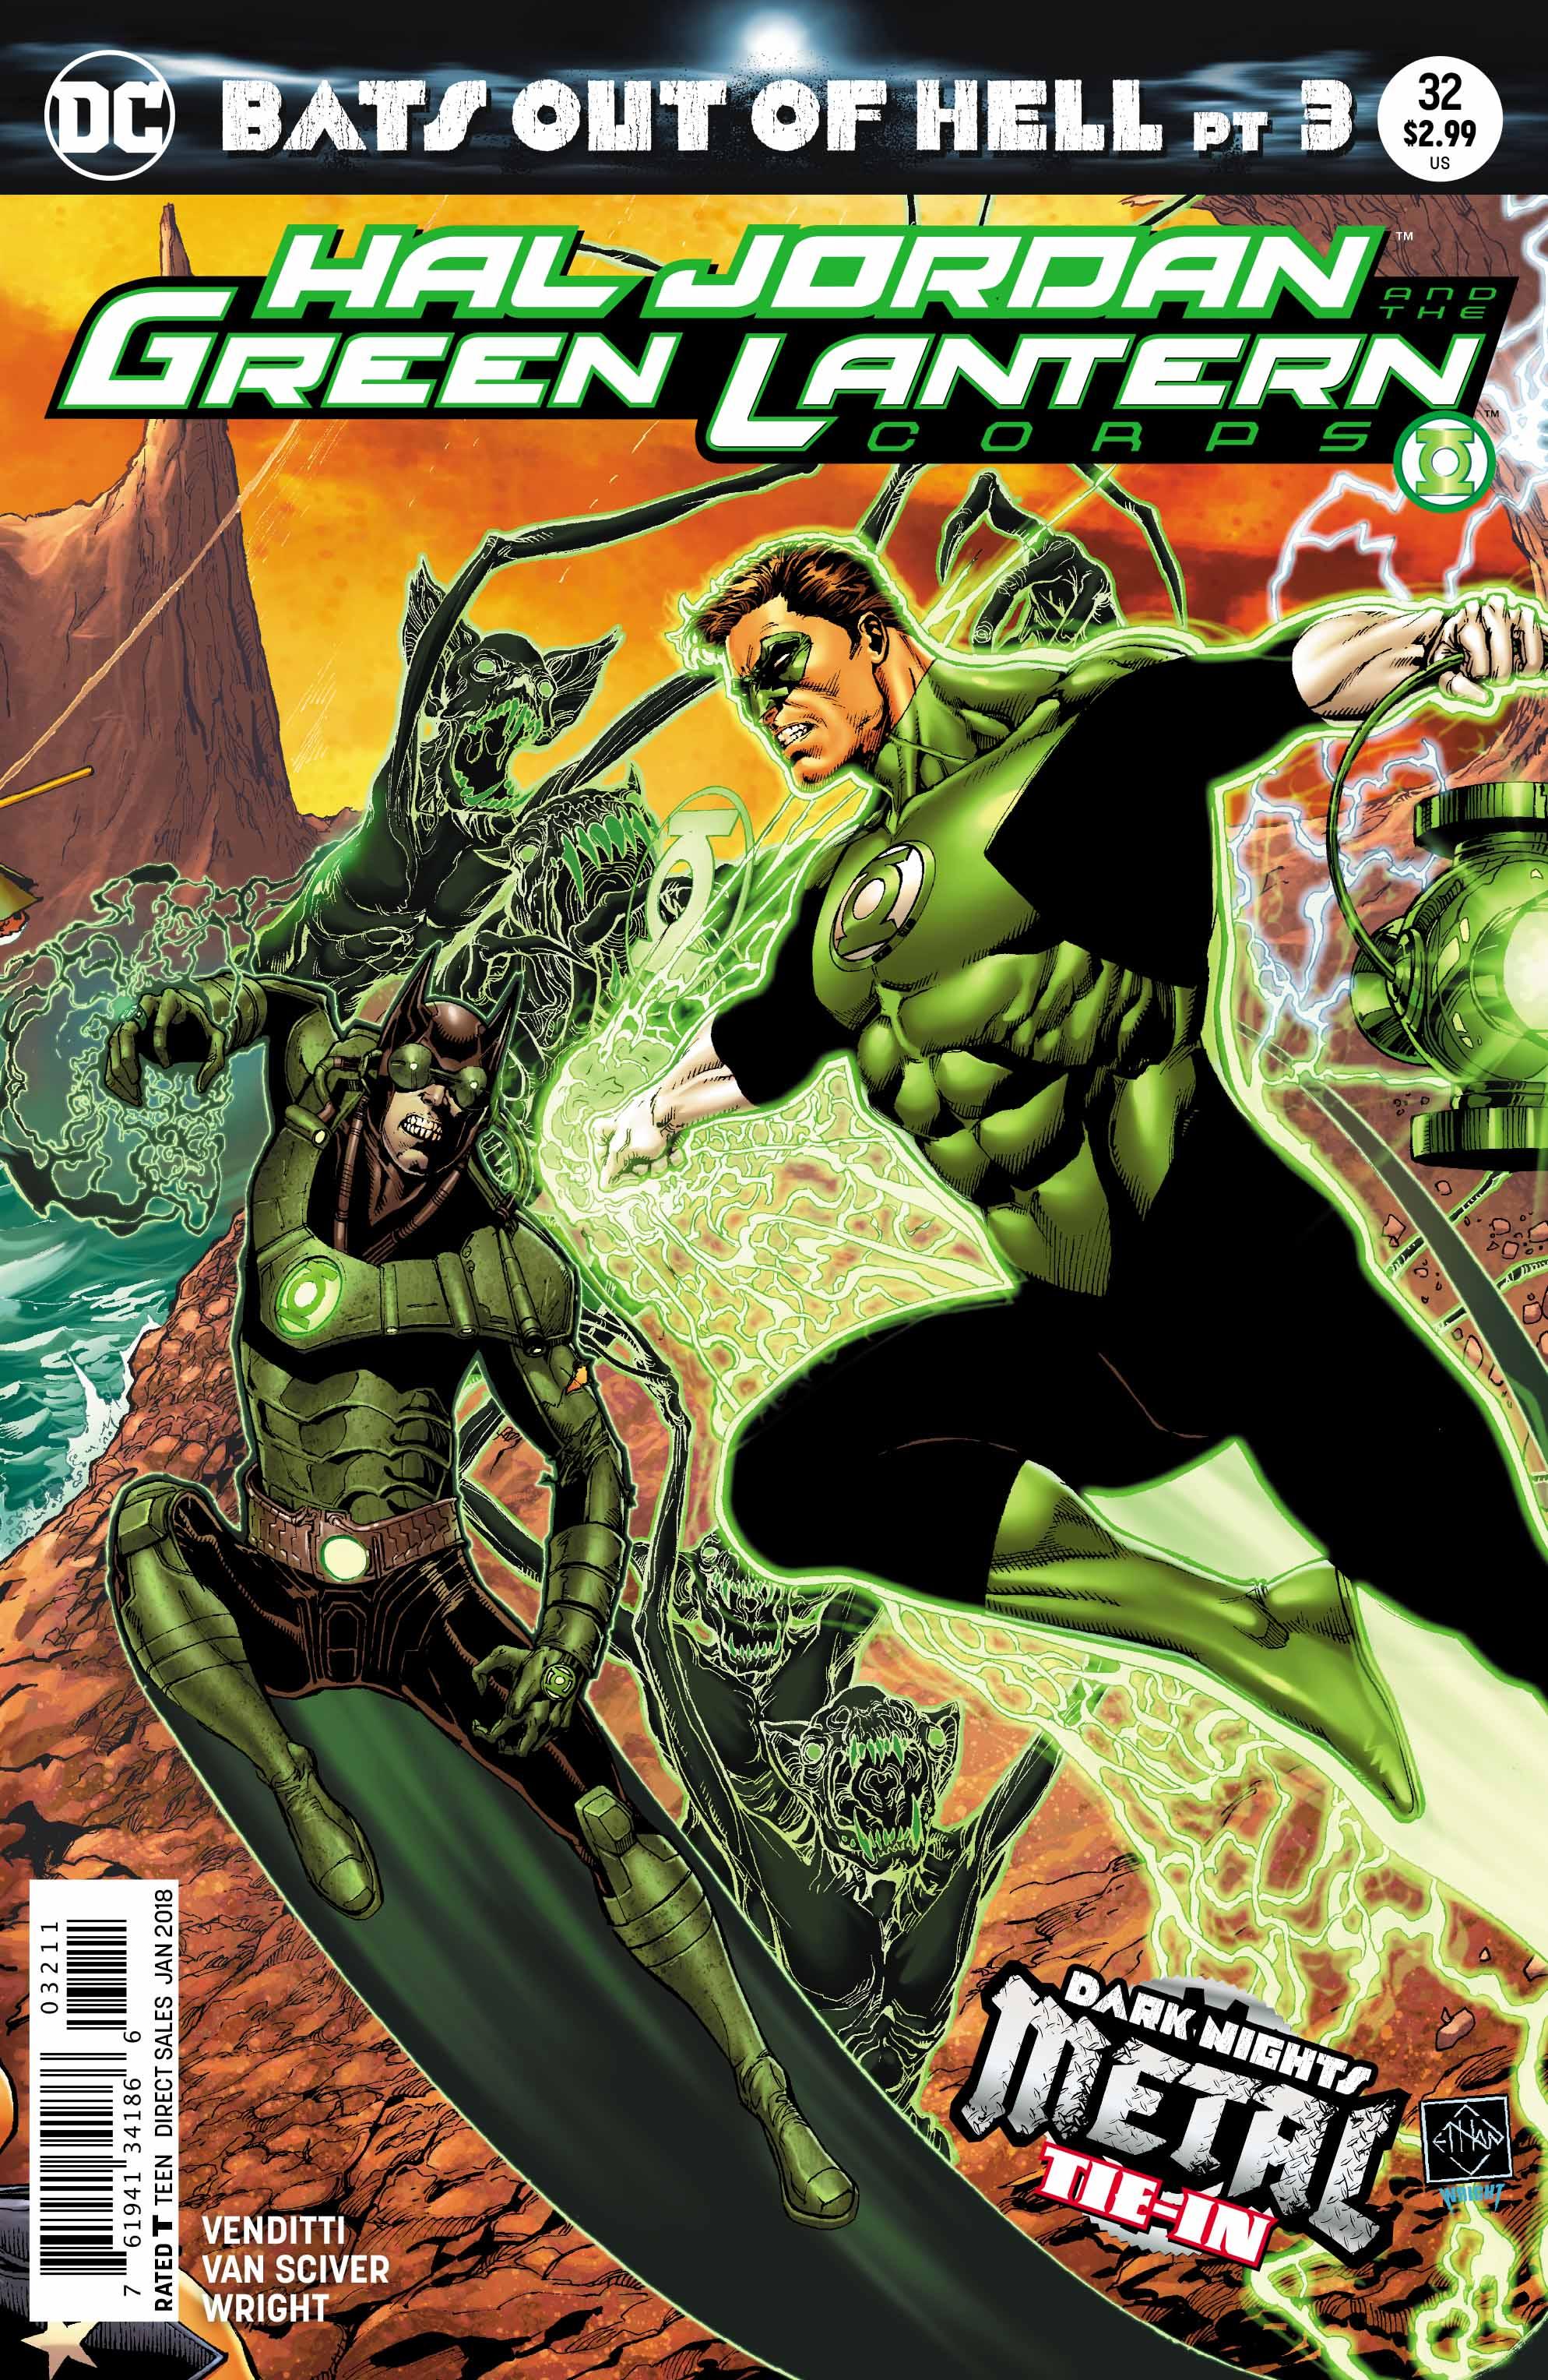 Hal Jordan and the Green Lantern Corps #32 (Metal Tie-In)